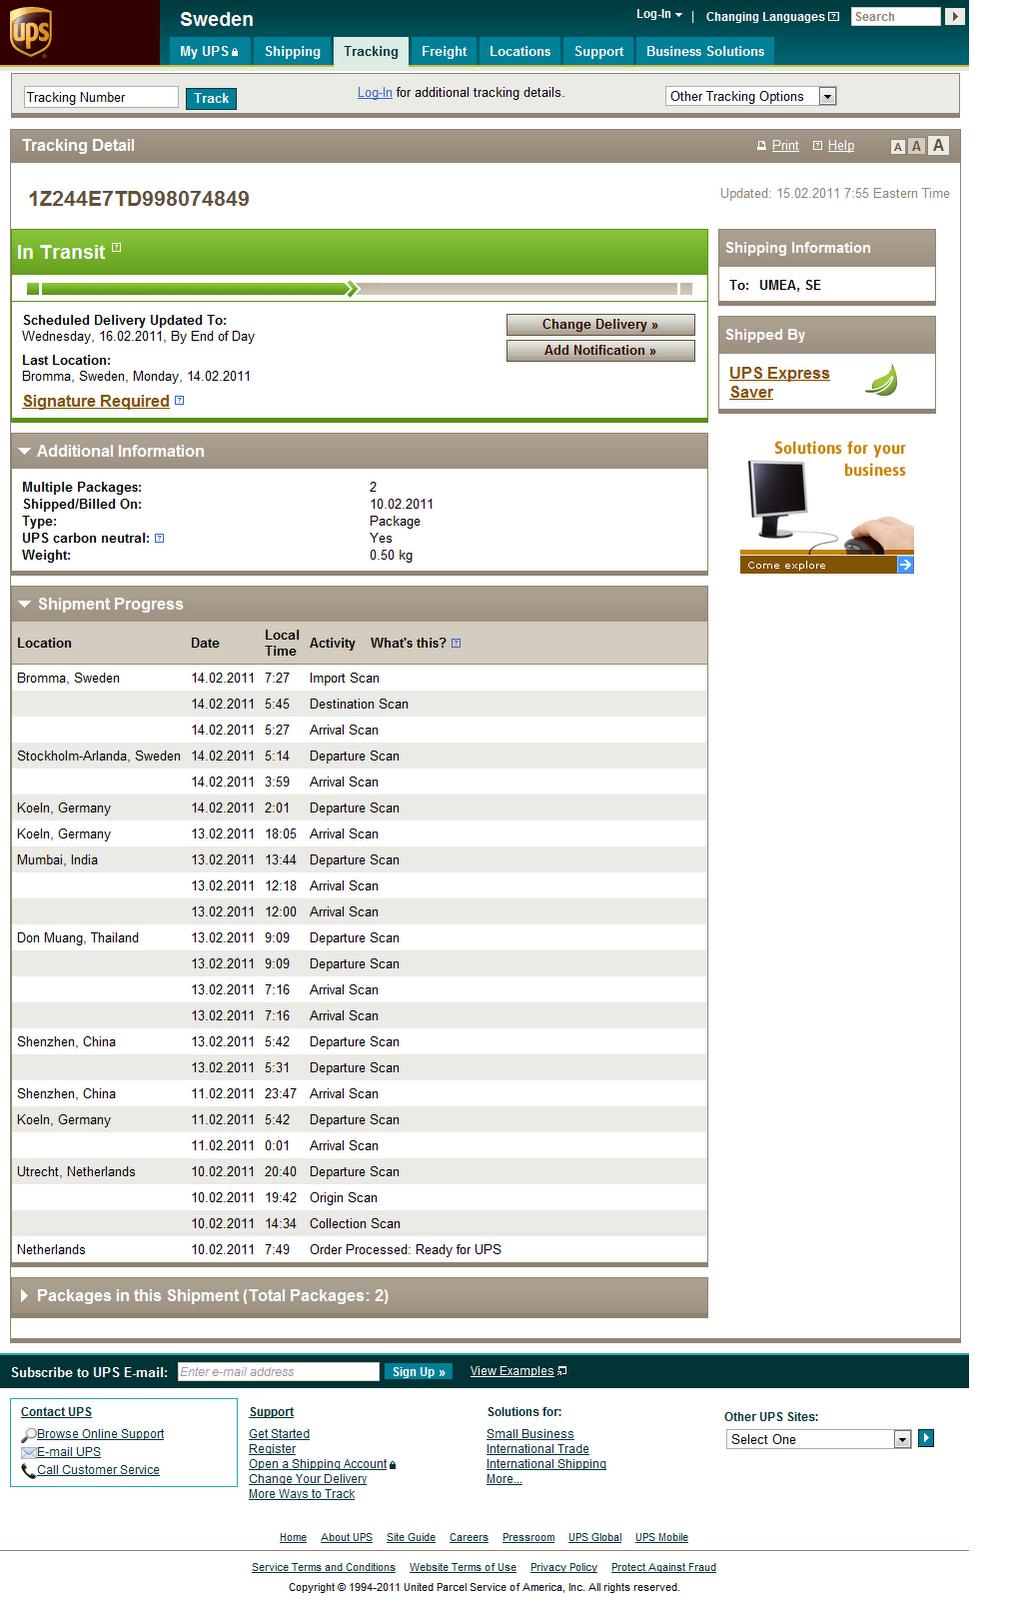 UPS Tracking info - FAIL